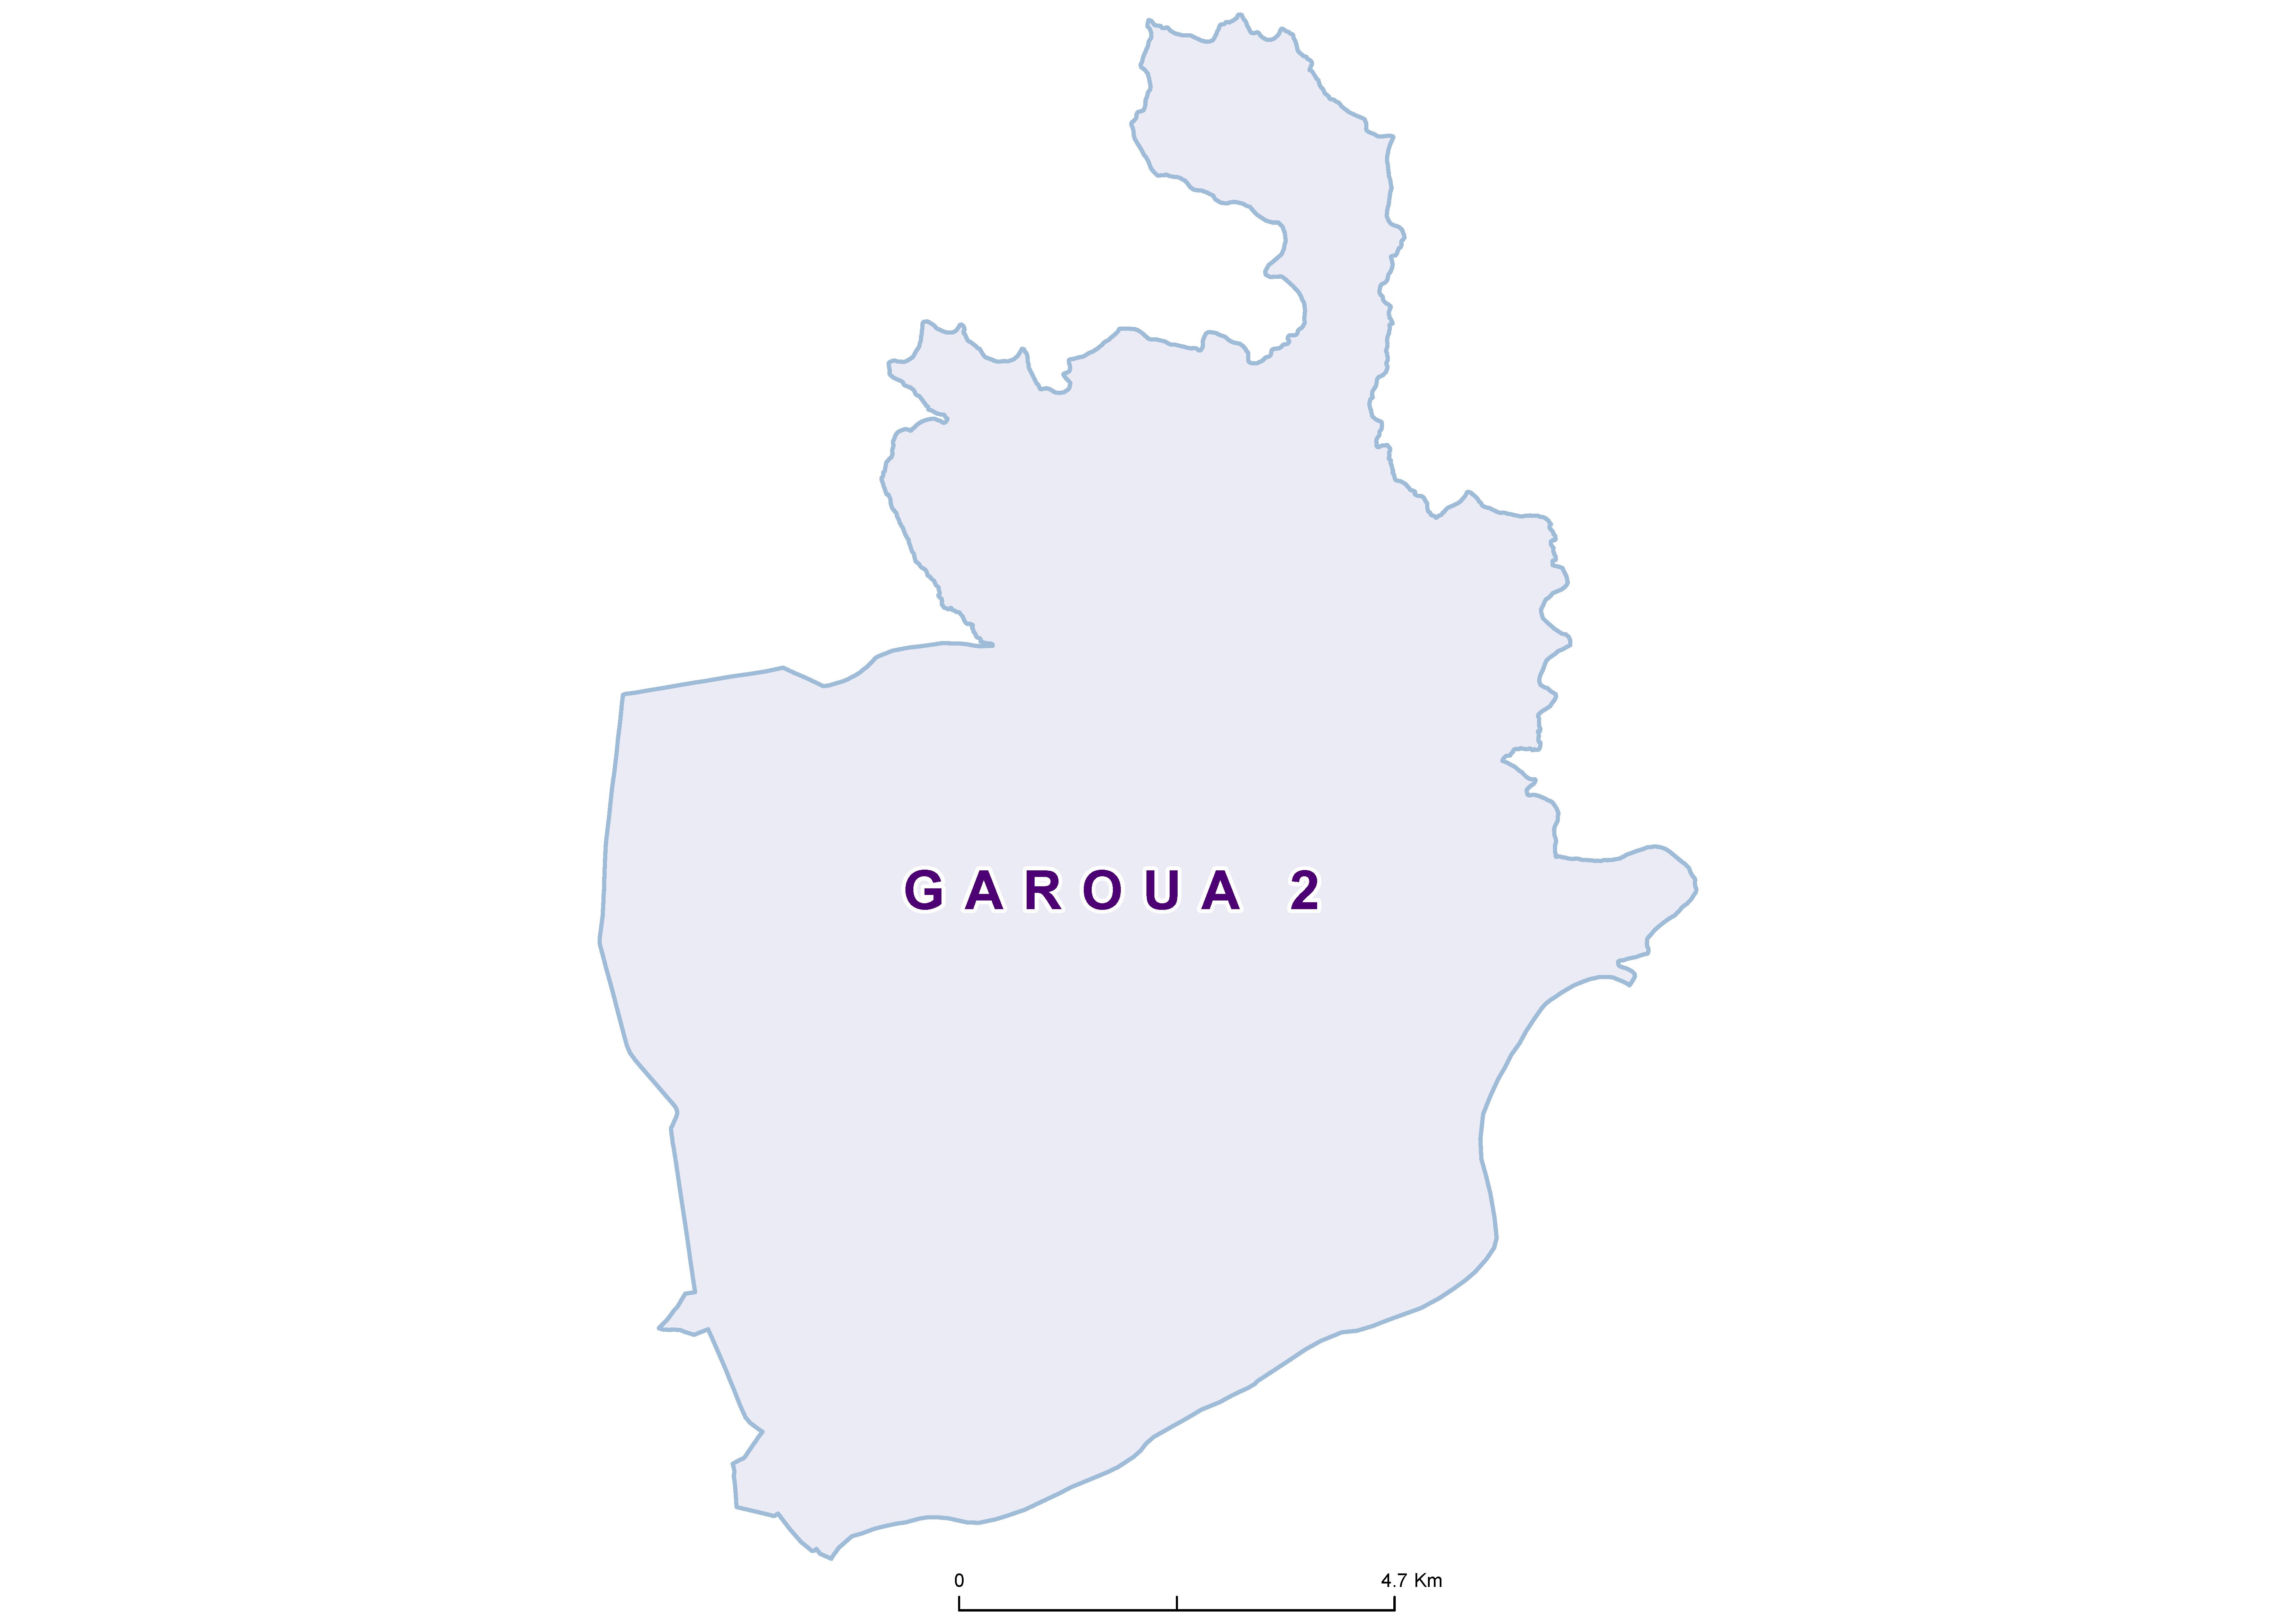 Garoua 2 Mean SCH 20180001